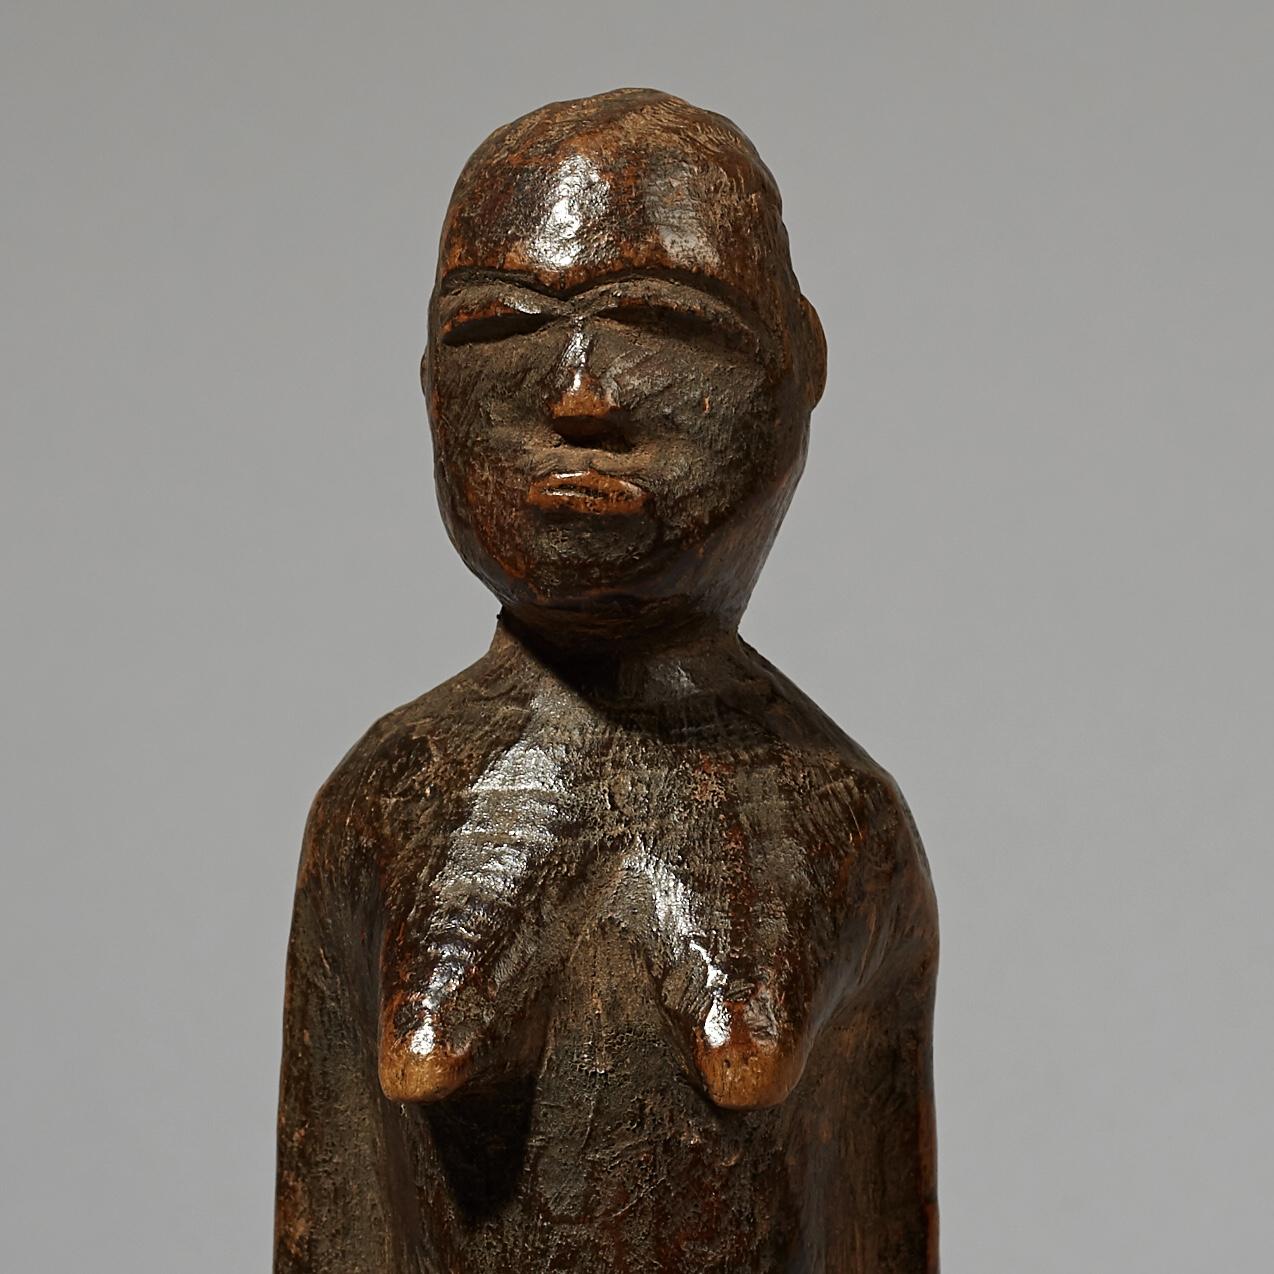 A THIL FIGURE WITH SHEENED PATINA, LOBI TRIBE IVORY COAST W AFRICA ( No 4174 )